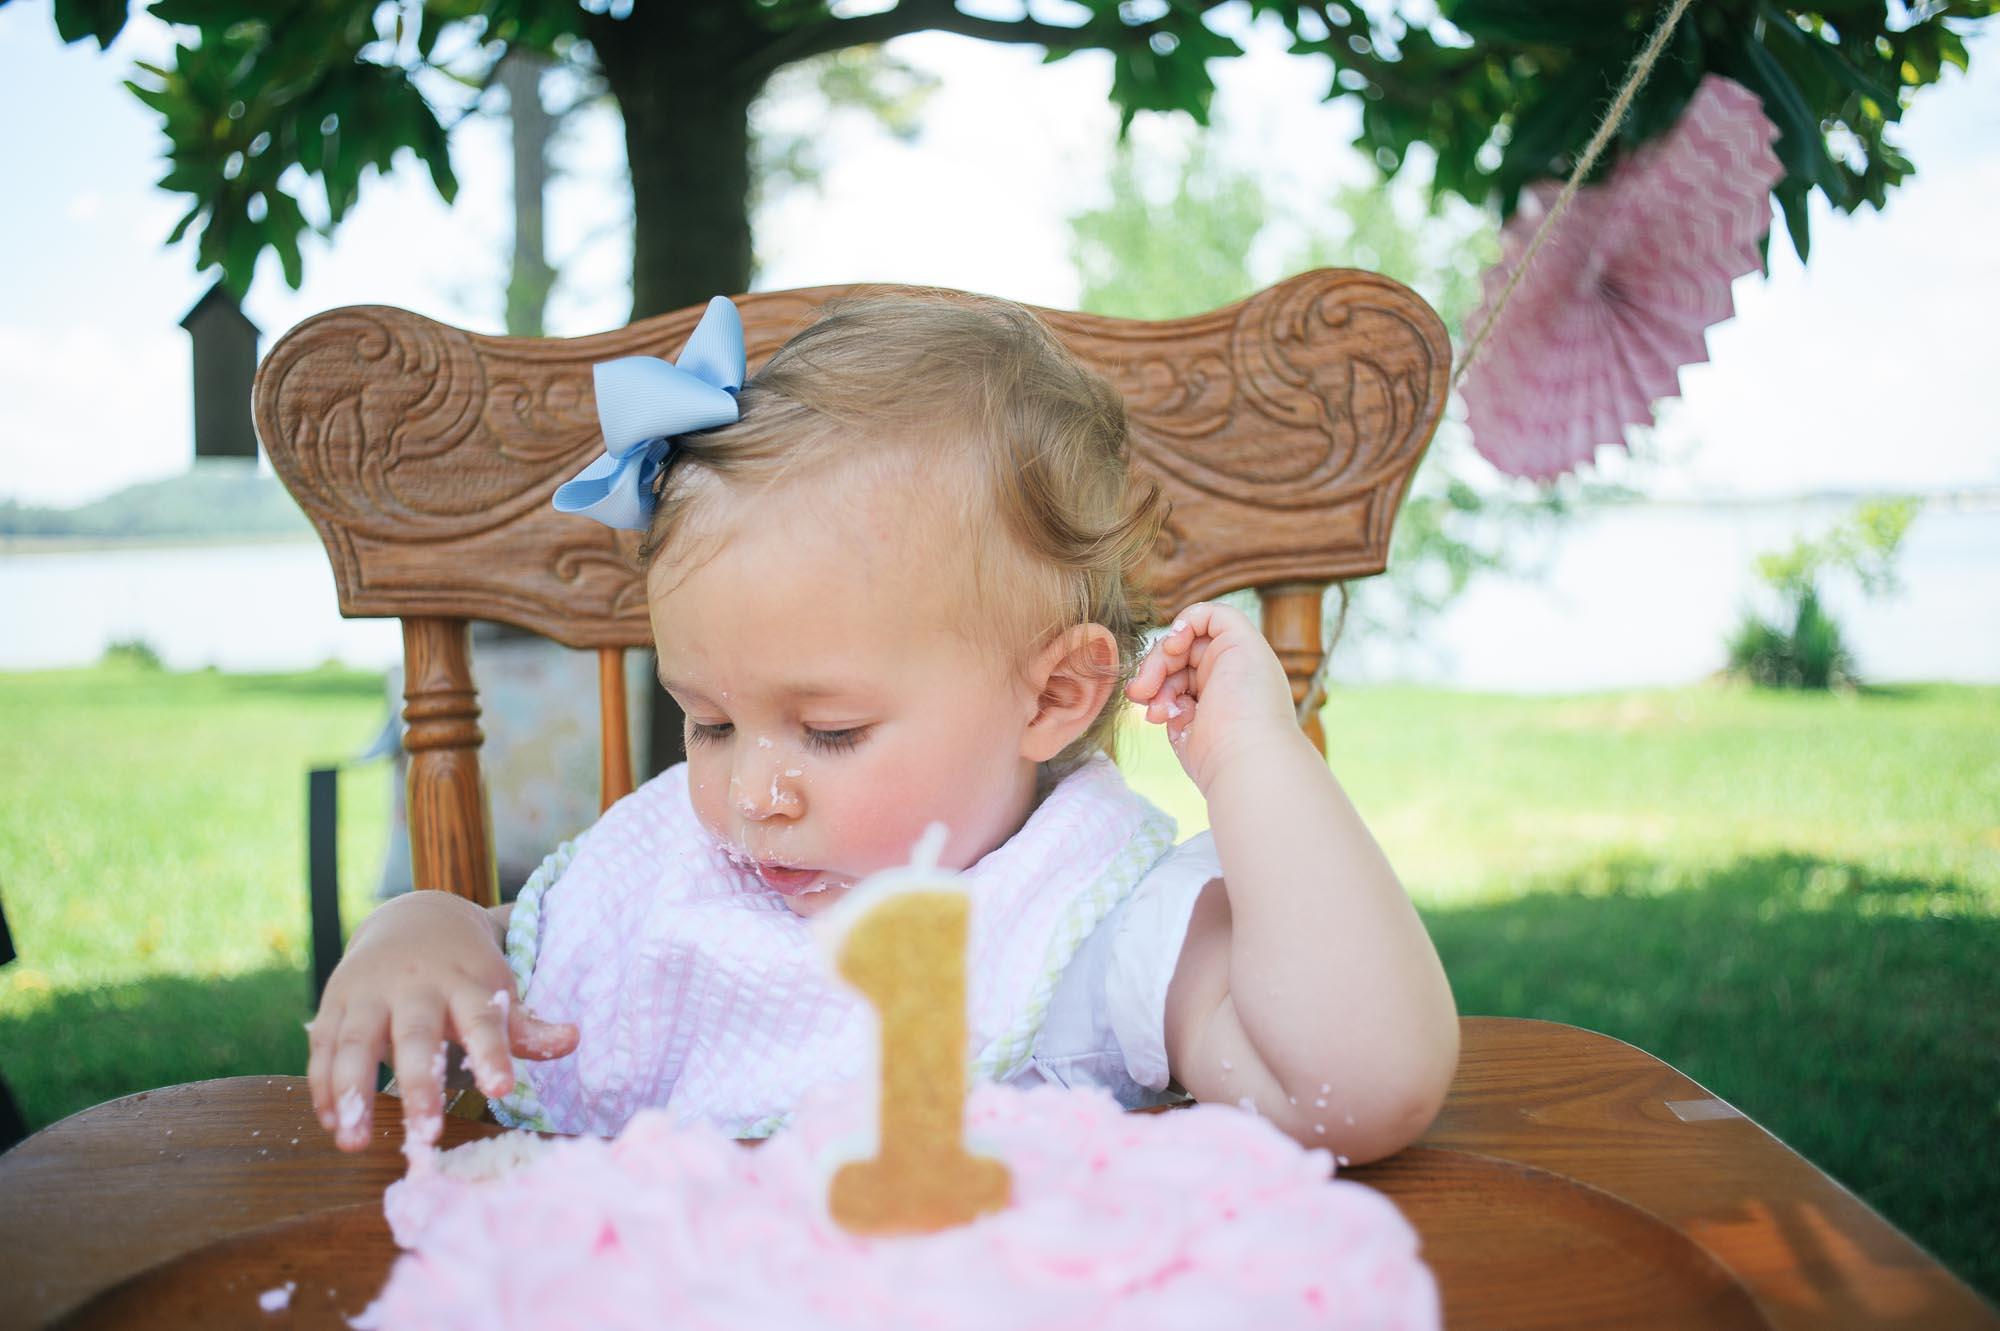 m.newsom-photography-one-year-old-girls-birthday-party-ideas-alice-in-wonderland (40 of 42).jpg